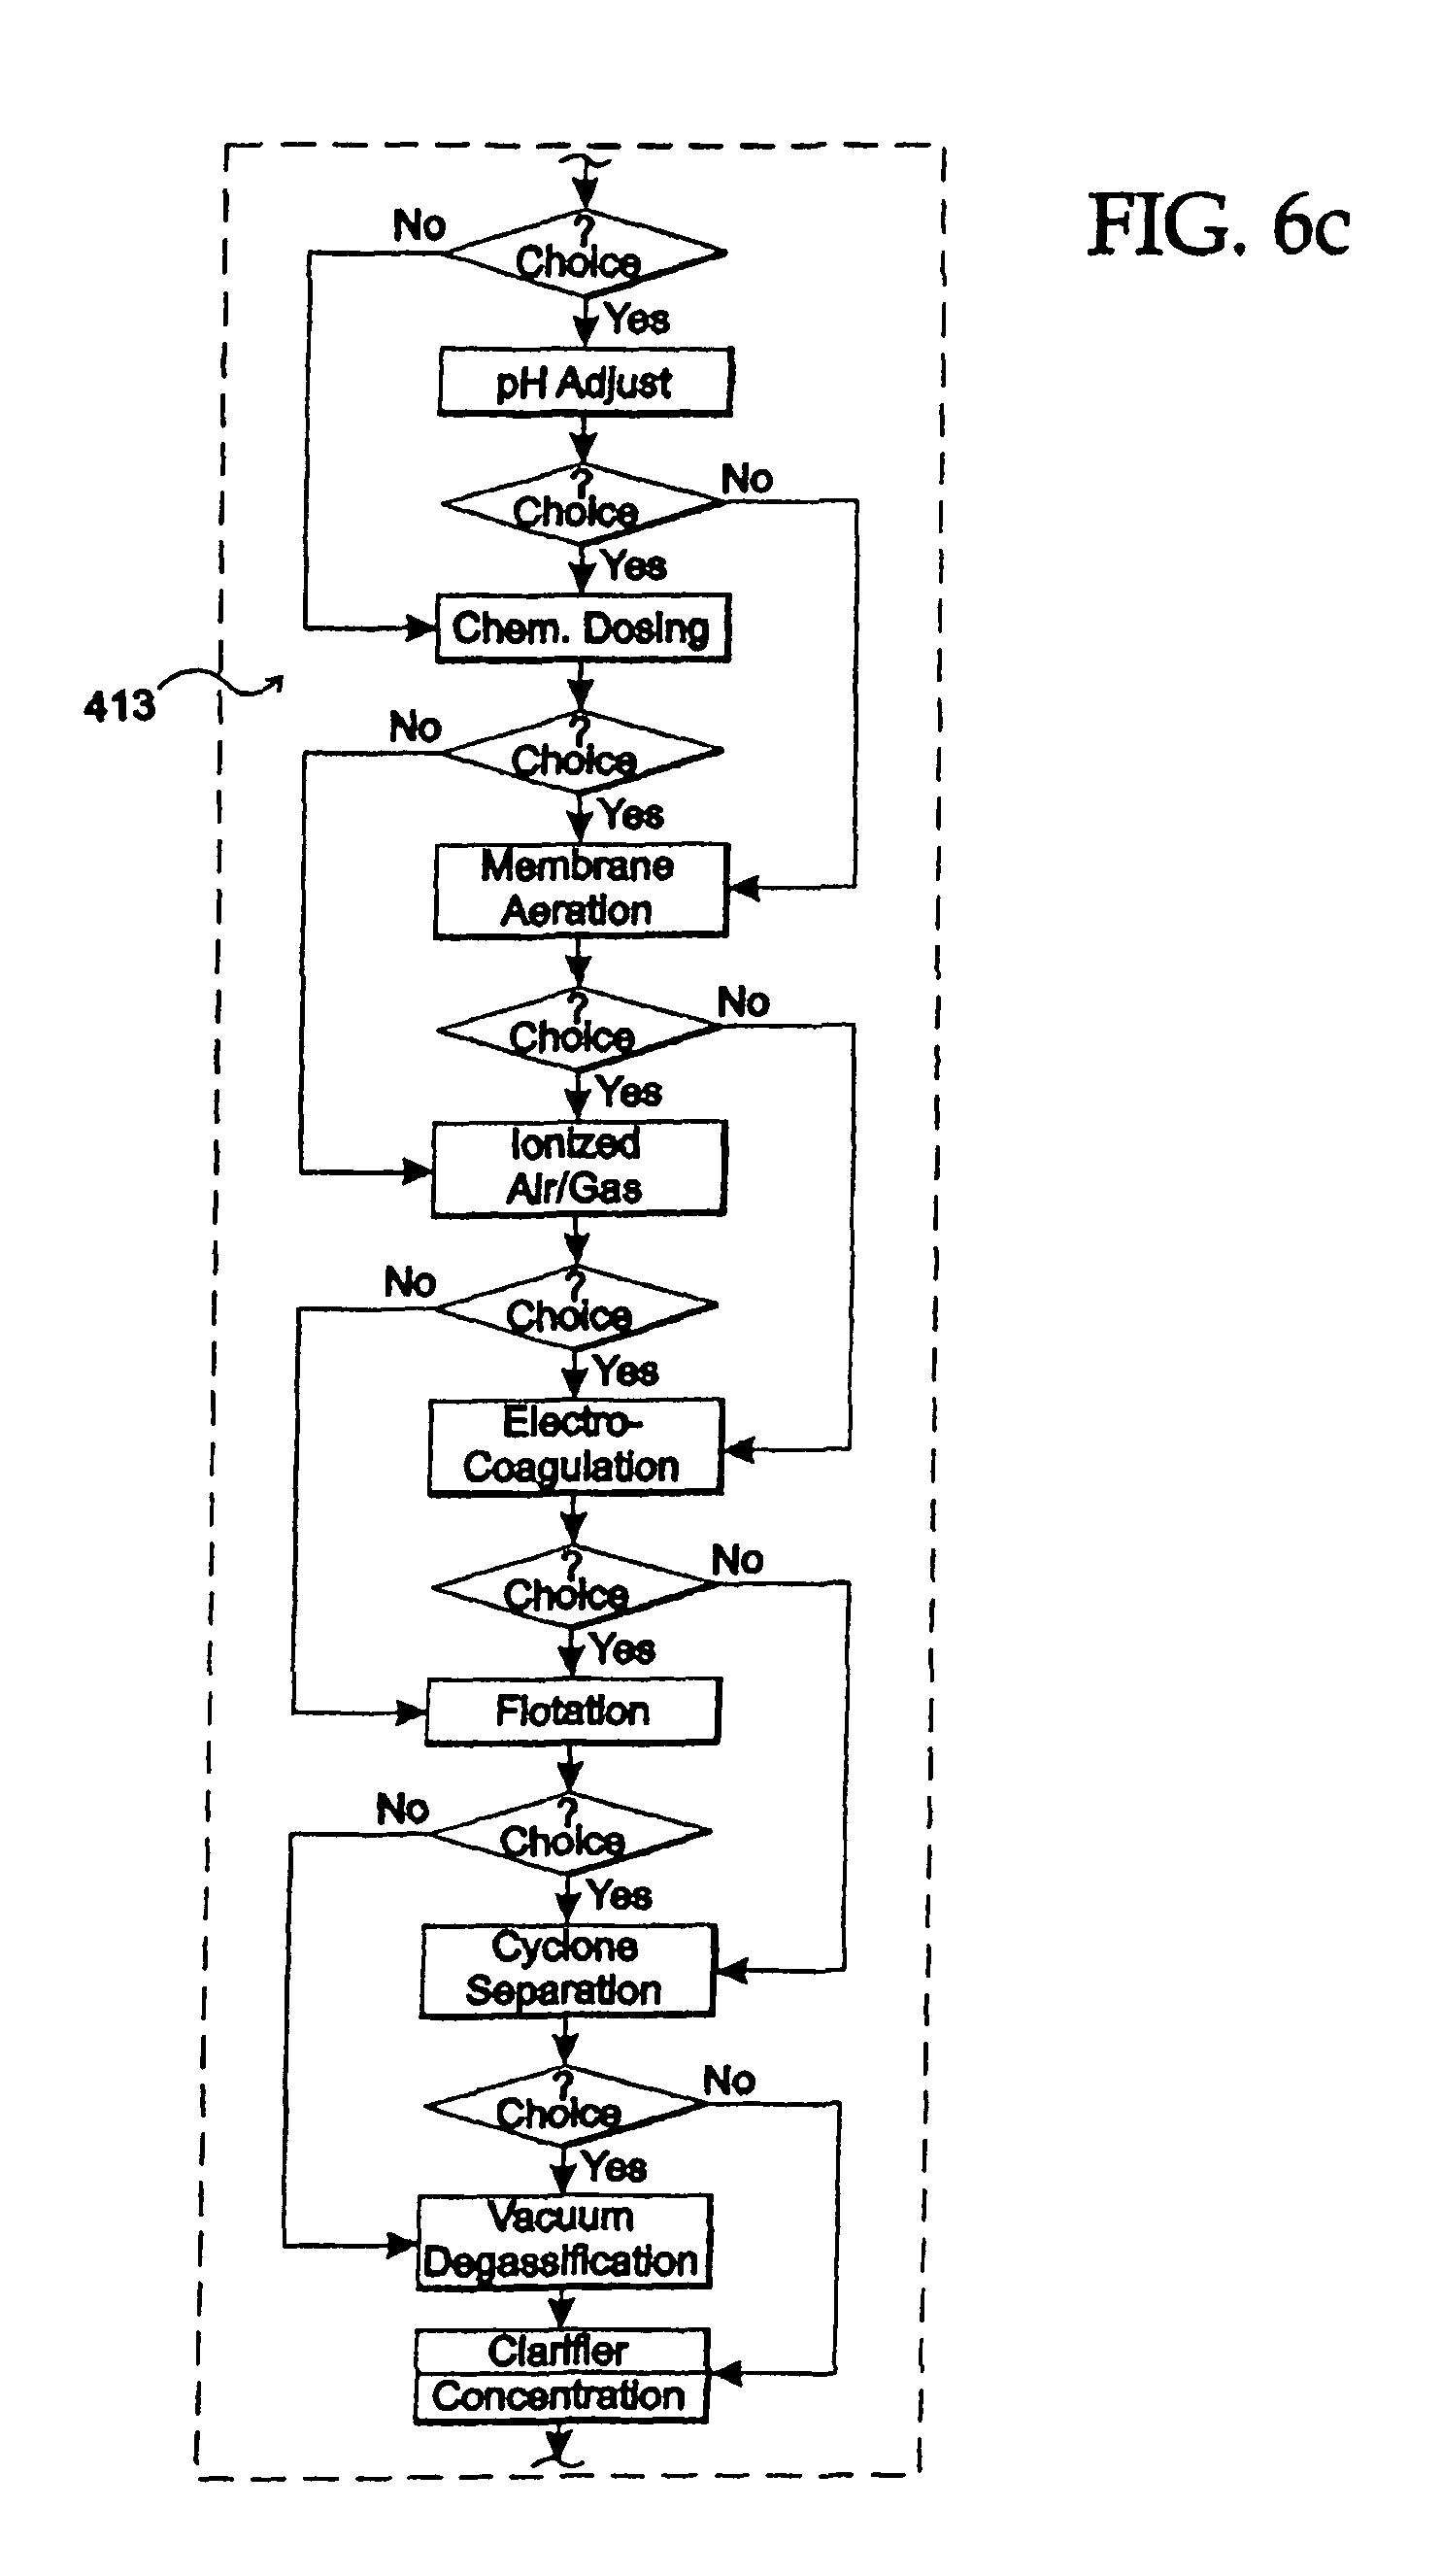 2002 Hyundai Elantra Stereo Wiring Diagram - Collection ...